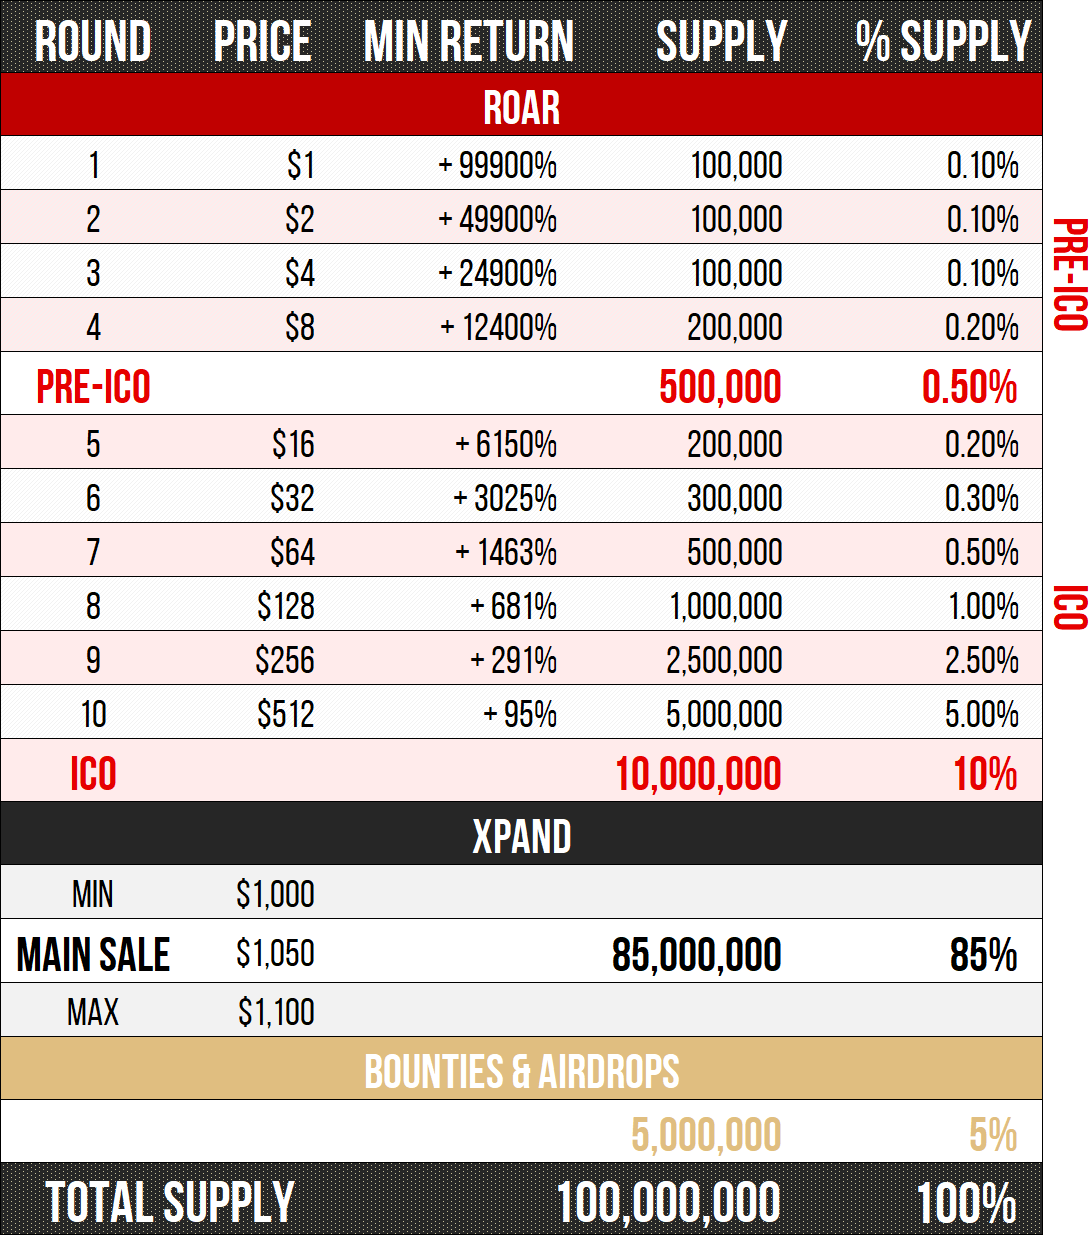 PREICO and ICO ROAR, XPAND Main sale